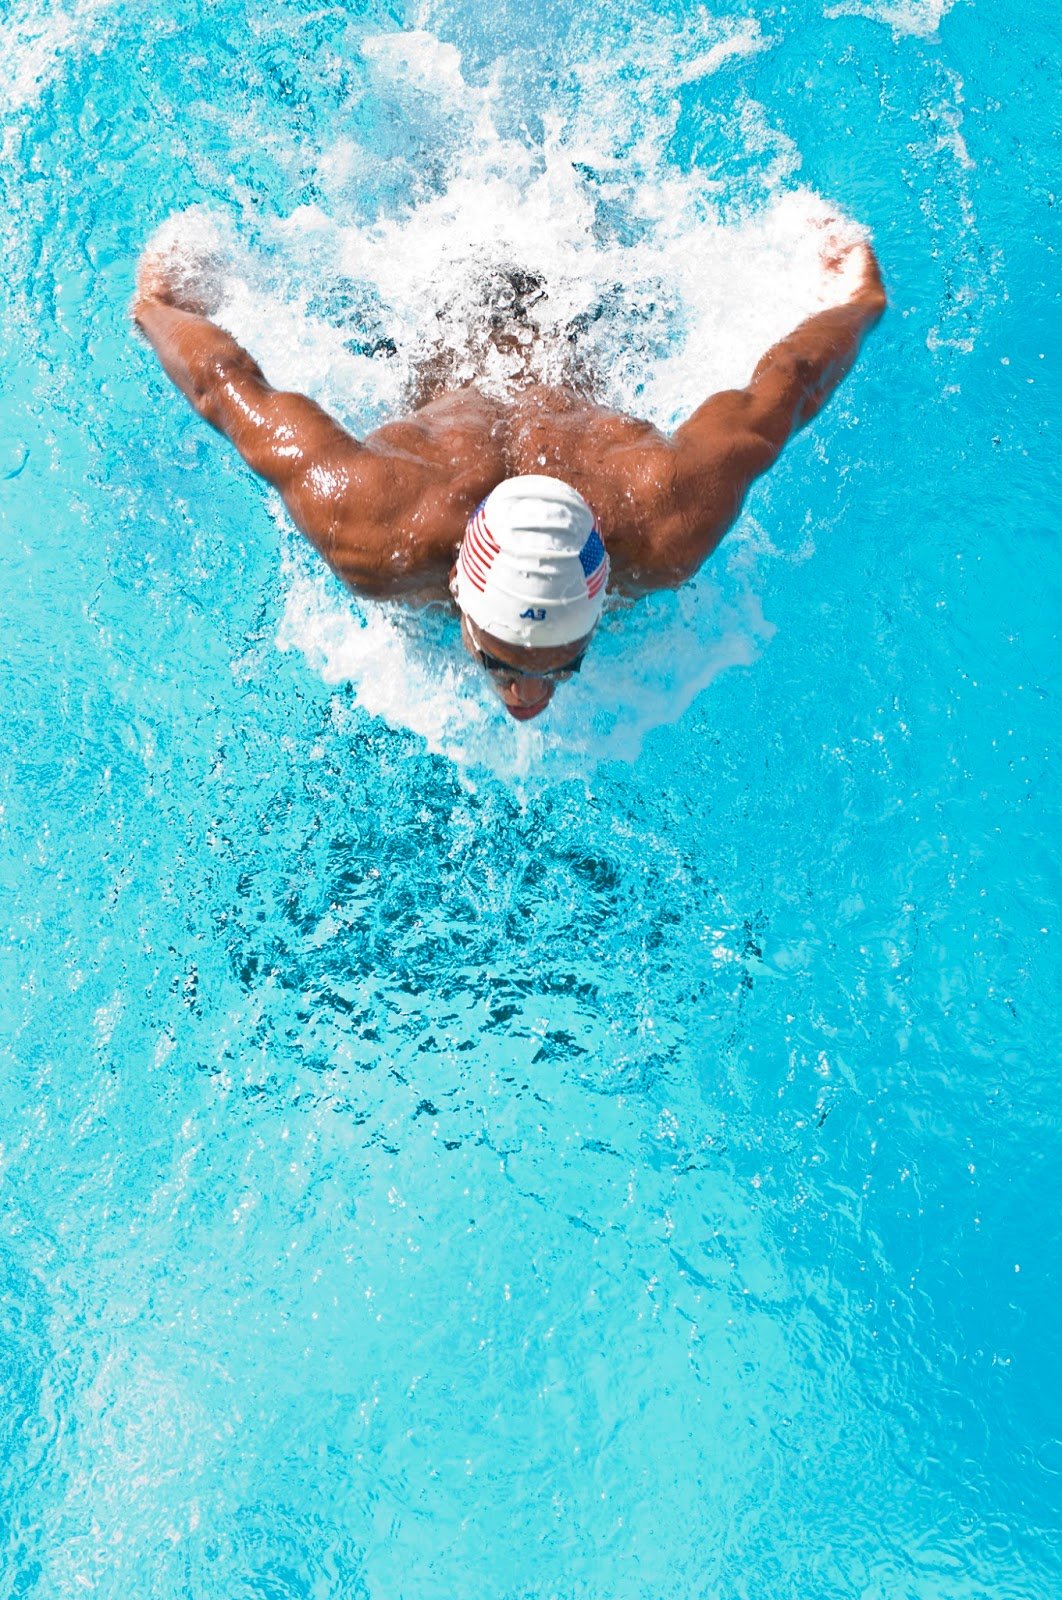 Sejarah Berenang : sejarah, berenang, Sejarah, Renang, Kupu-Kupu, ATURAN, PERMAINAN